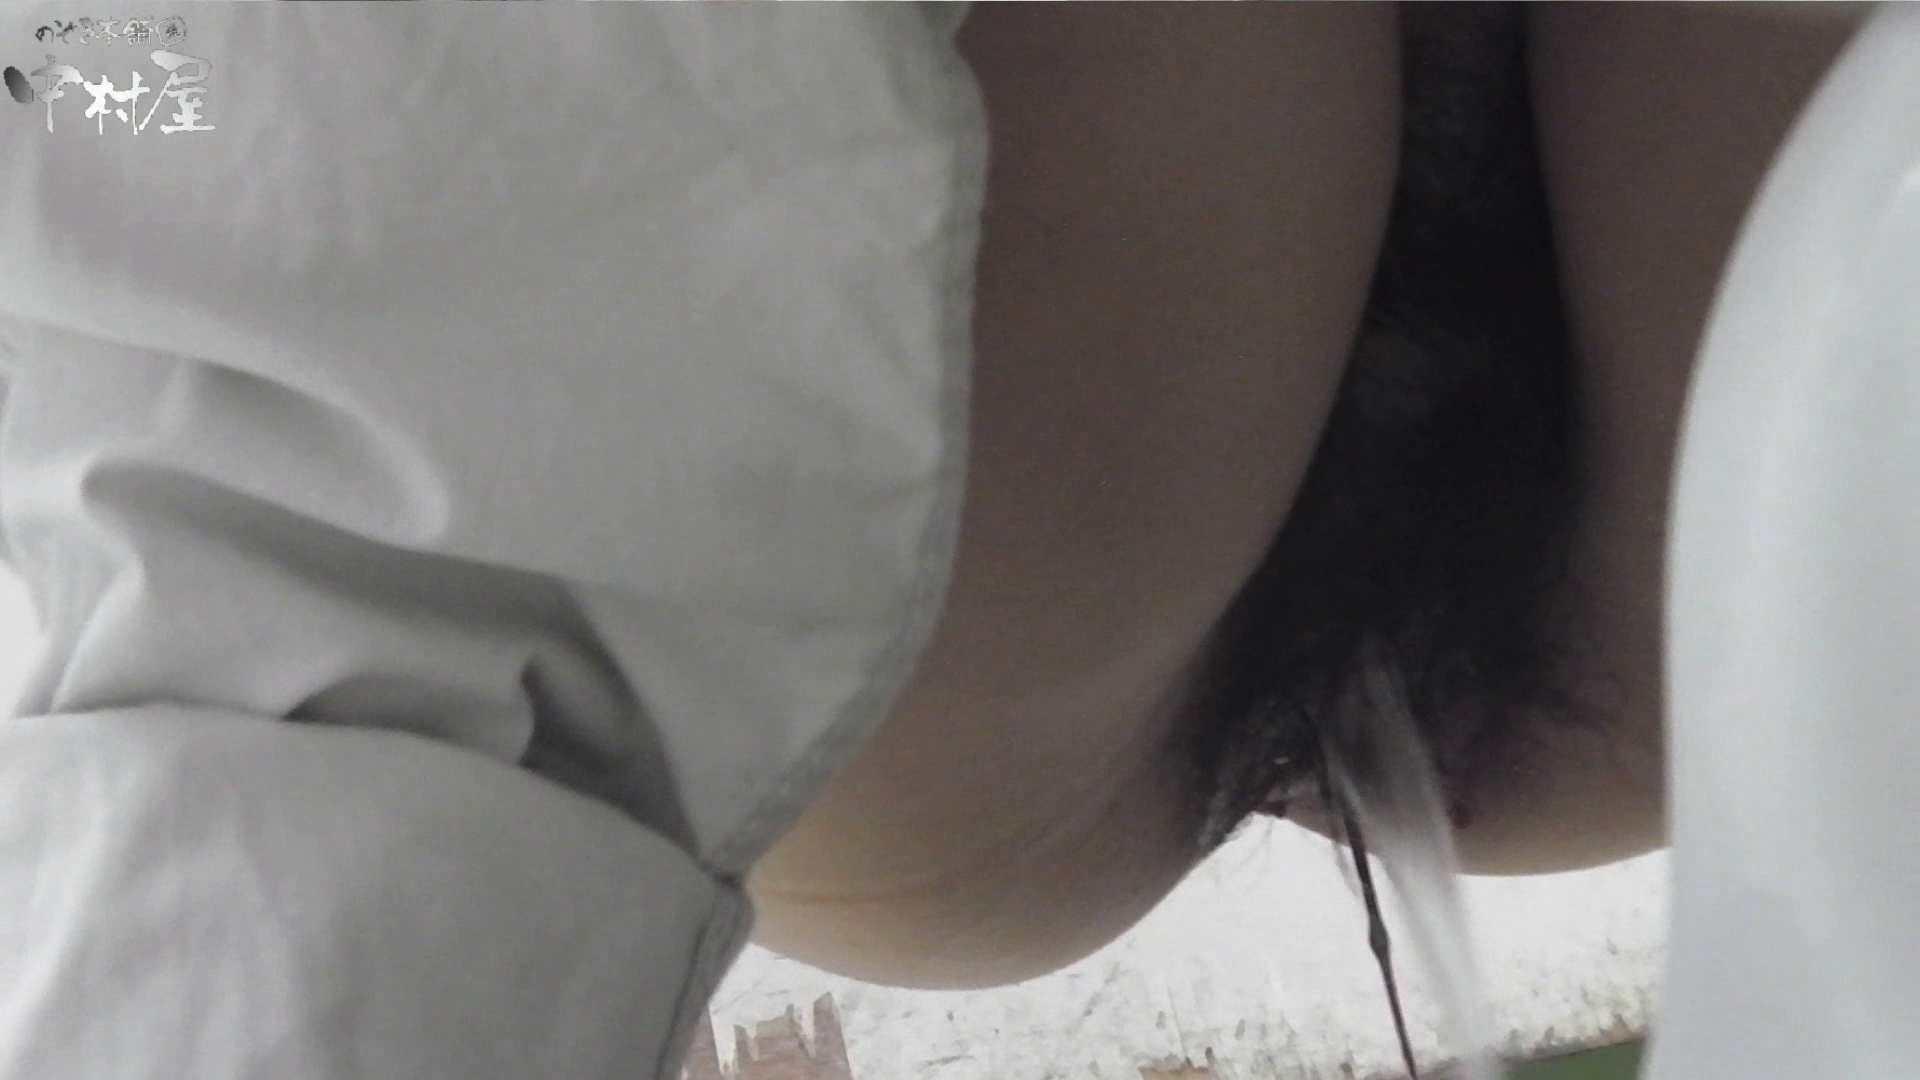 vol.38 命がけ潜伏洗面所! 巨乳さん・固め・推定200g プライベート 盗撮ヌード画像 56画像 24